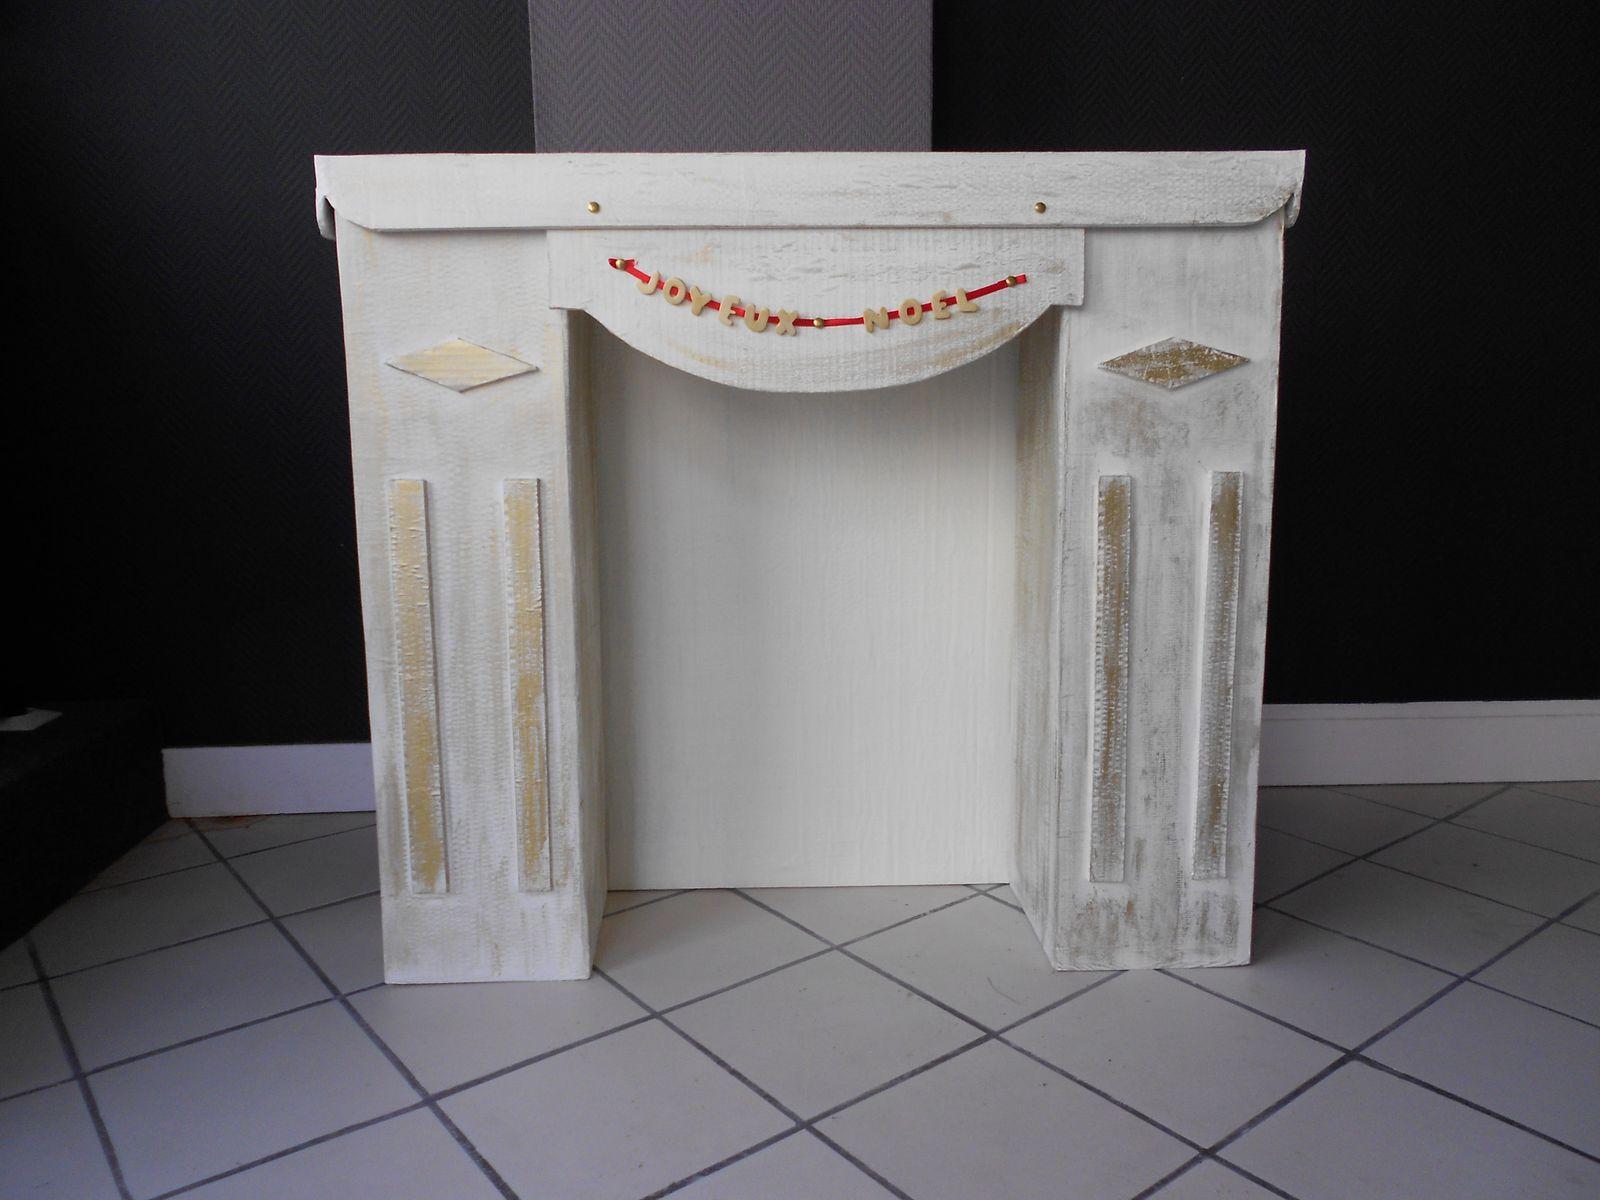 cheminee carton noel dscf with cheminee carton noel free cheminee en carton noel tout cor noel. Black Bedroom Furniture Sets. Home Design Ideas